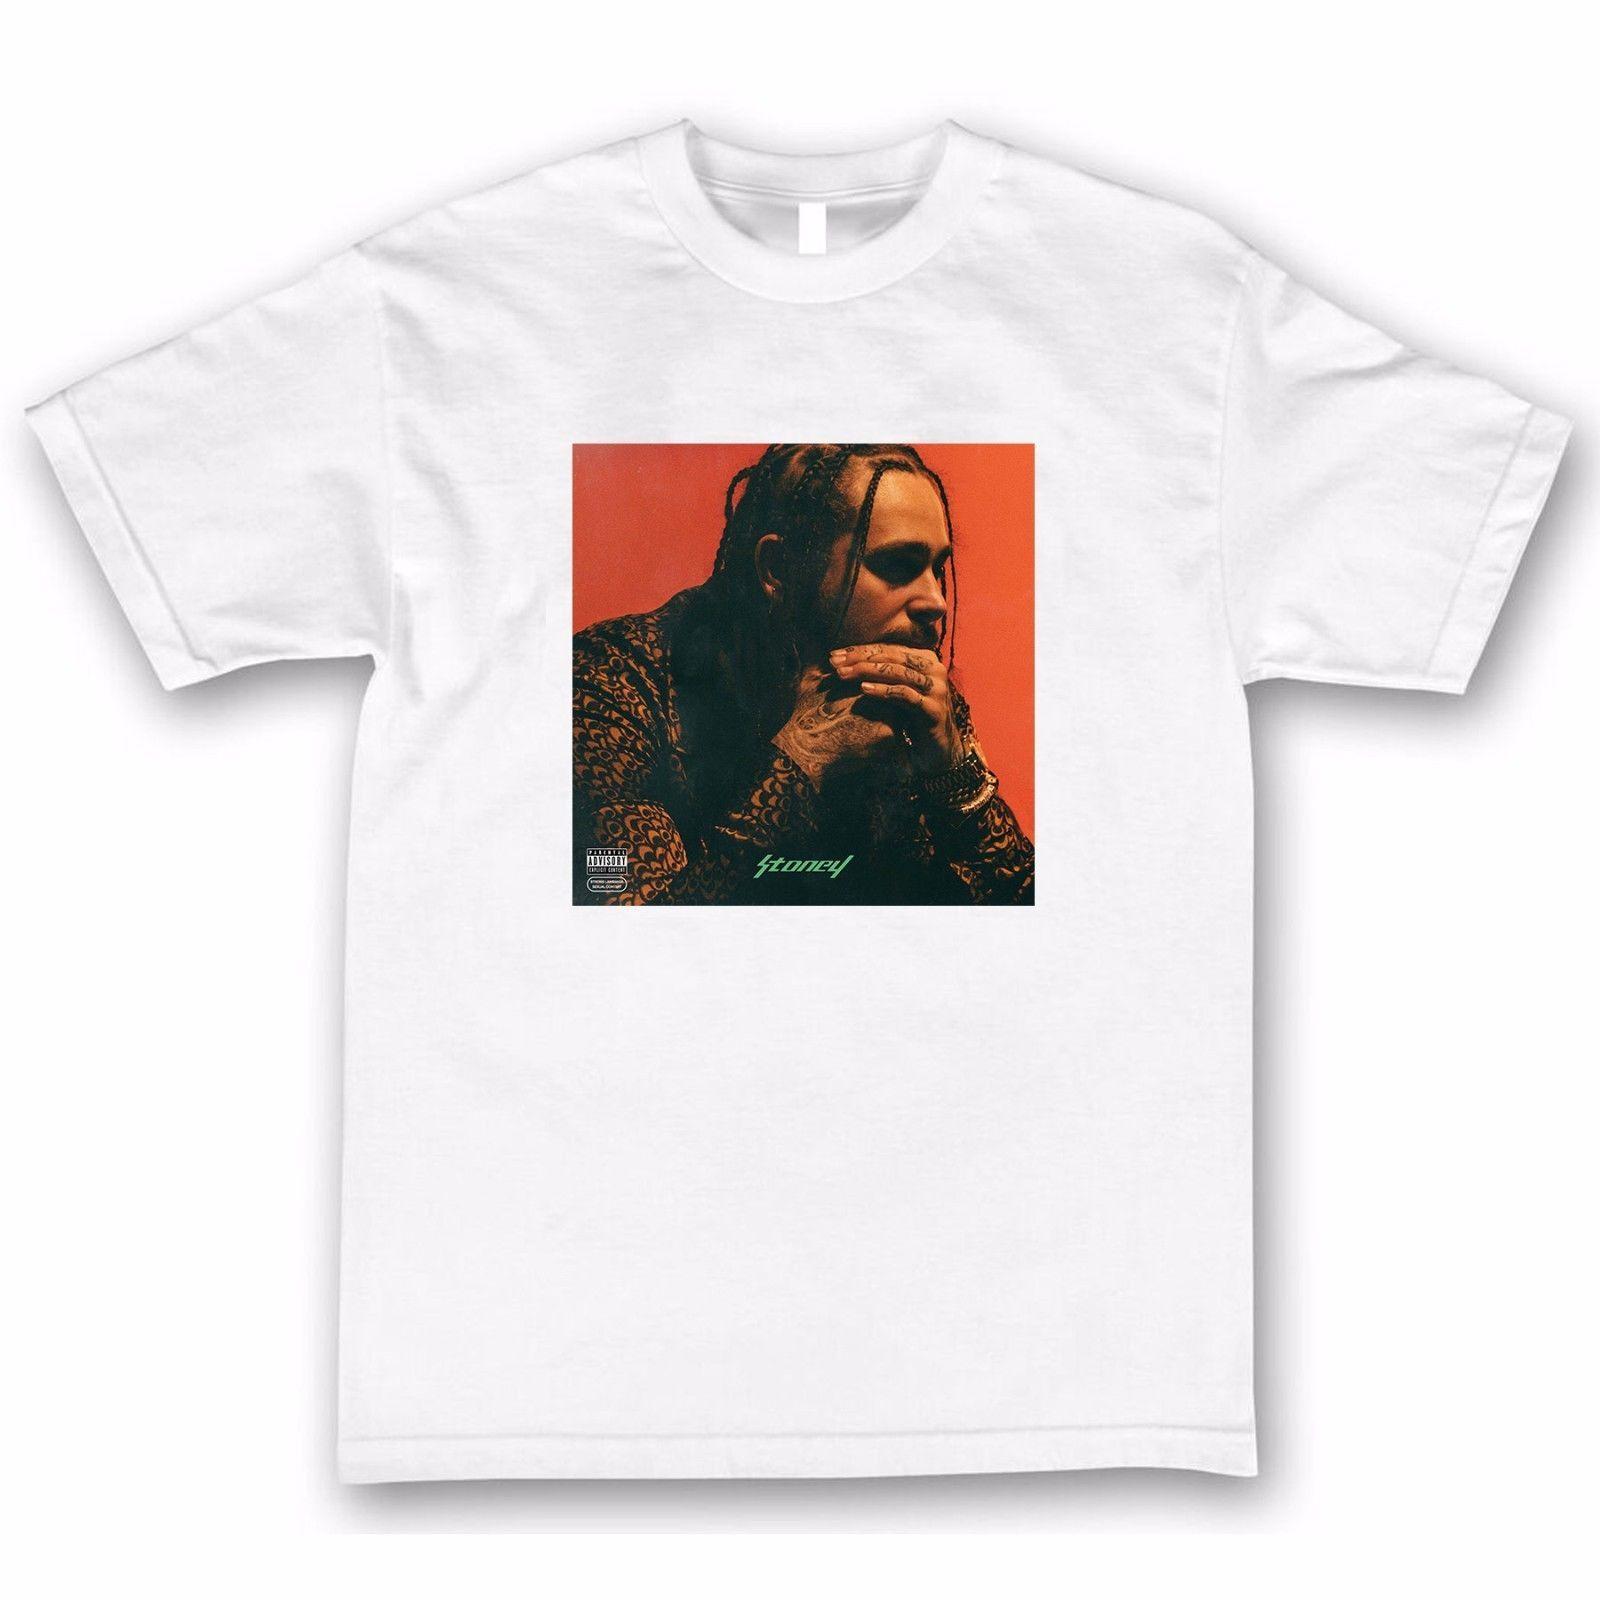 Post Malone Stoney T Shirt Tee Shirts 3D T Shirt Men Plus Size Cotton Tops  Tee Hipster Tee Shirt Homme T Shirt Sale Cool Shirt Designs From Pingguo1 ac865fbc6